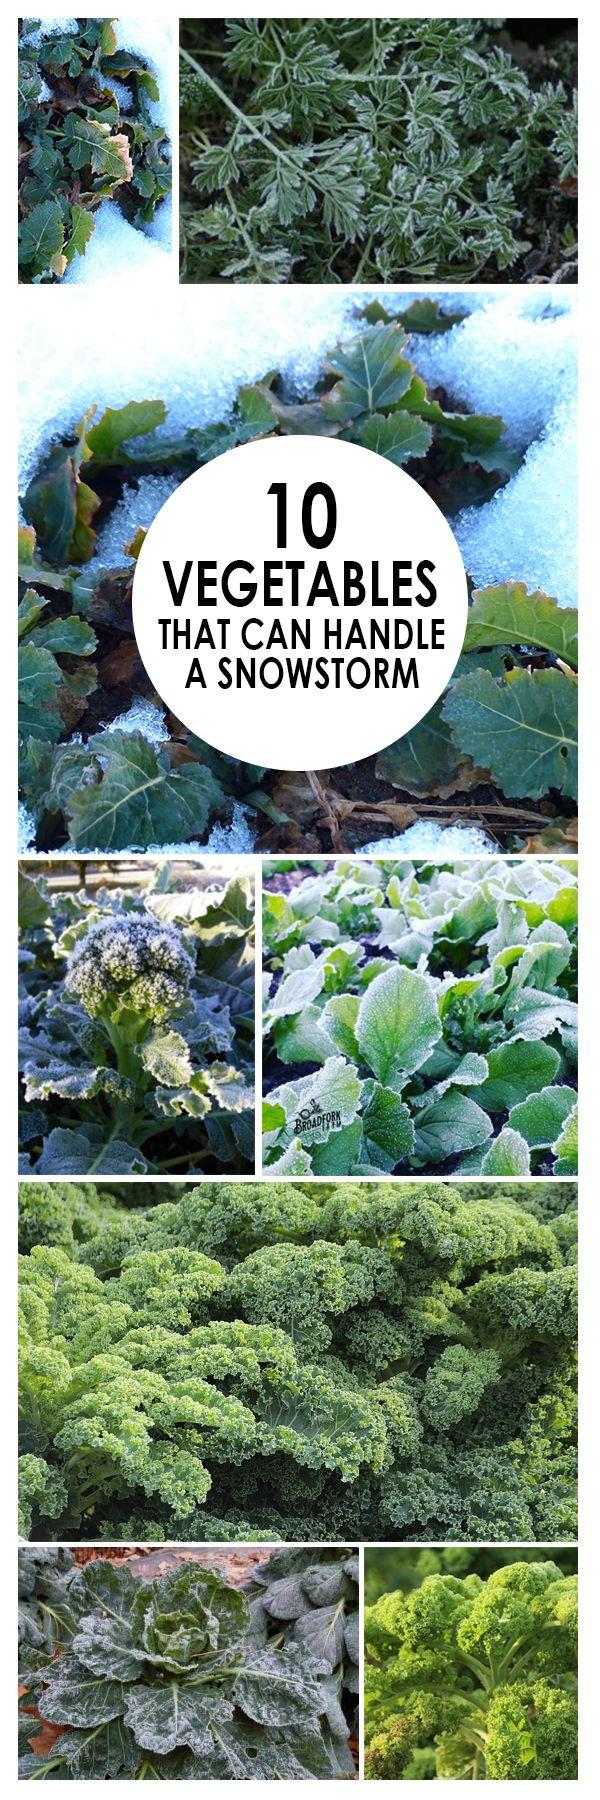 vegetables winter gardening winter gardening hacks popular pin